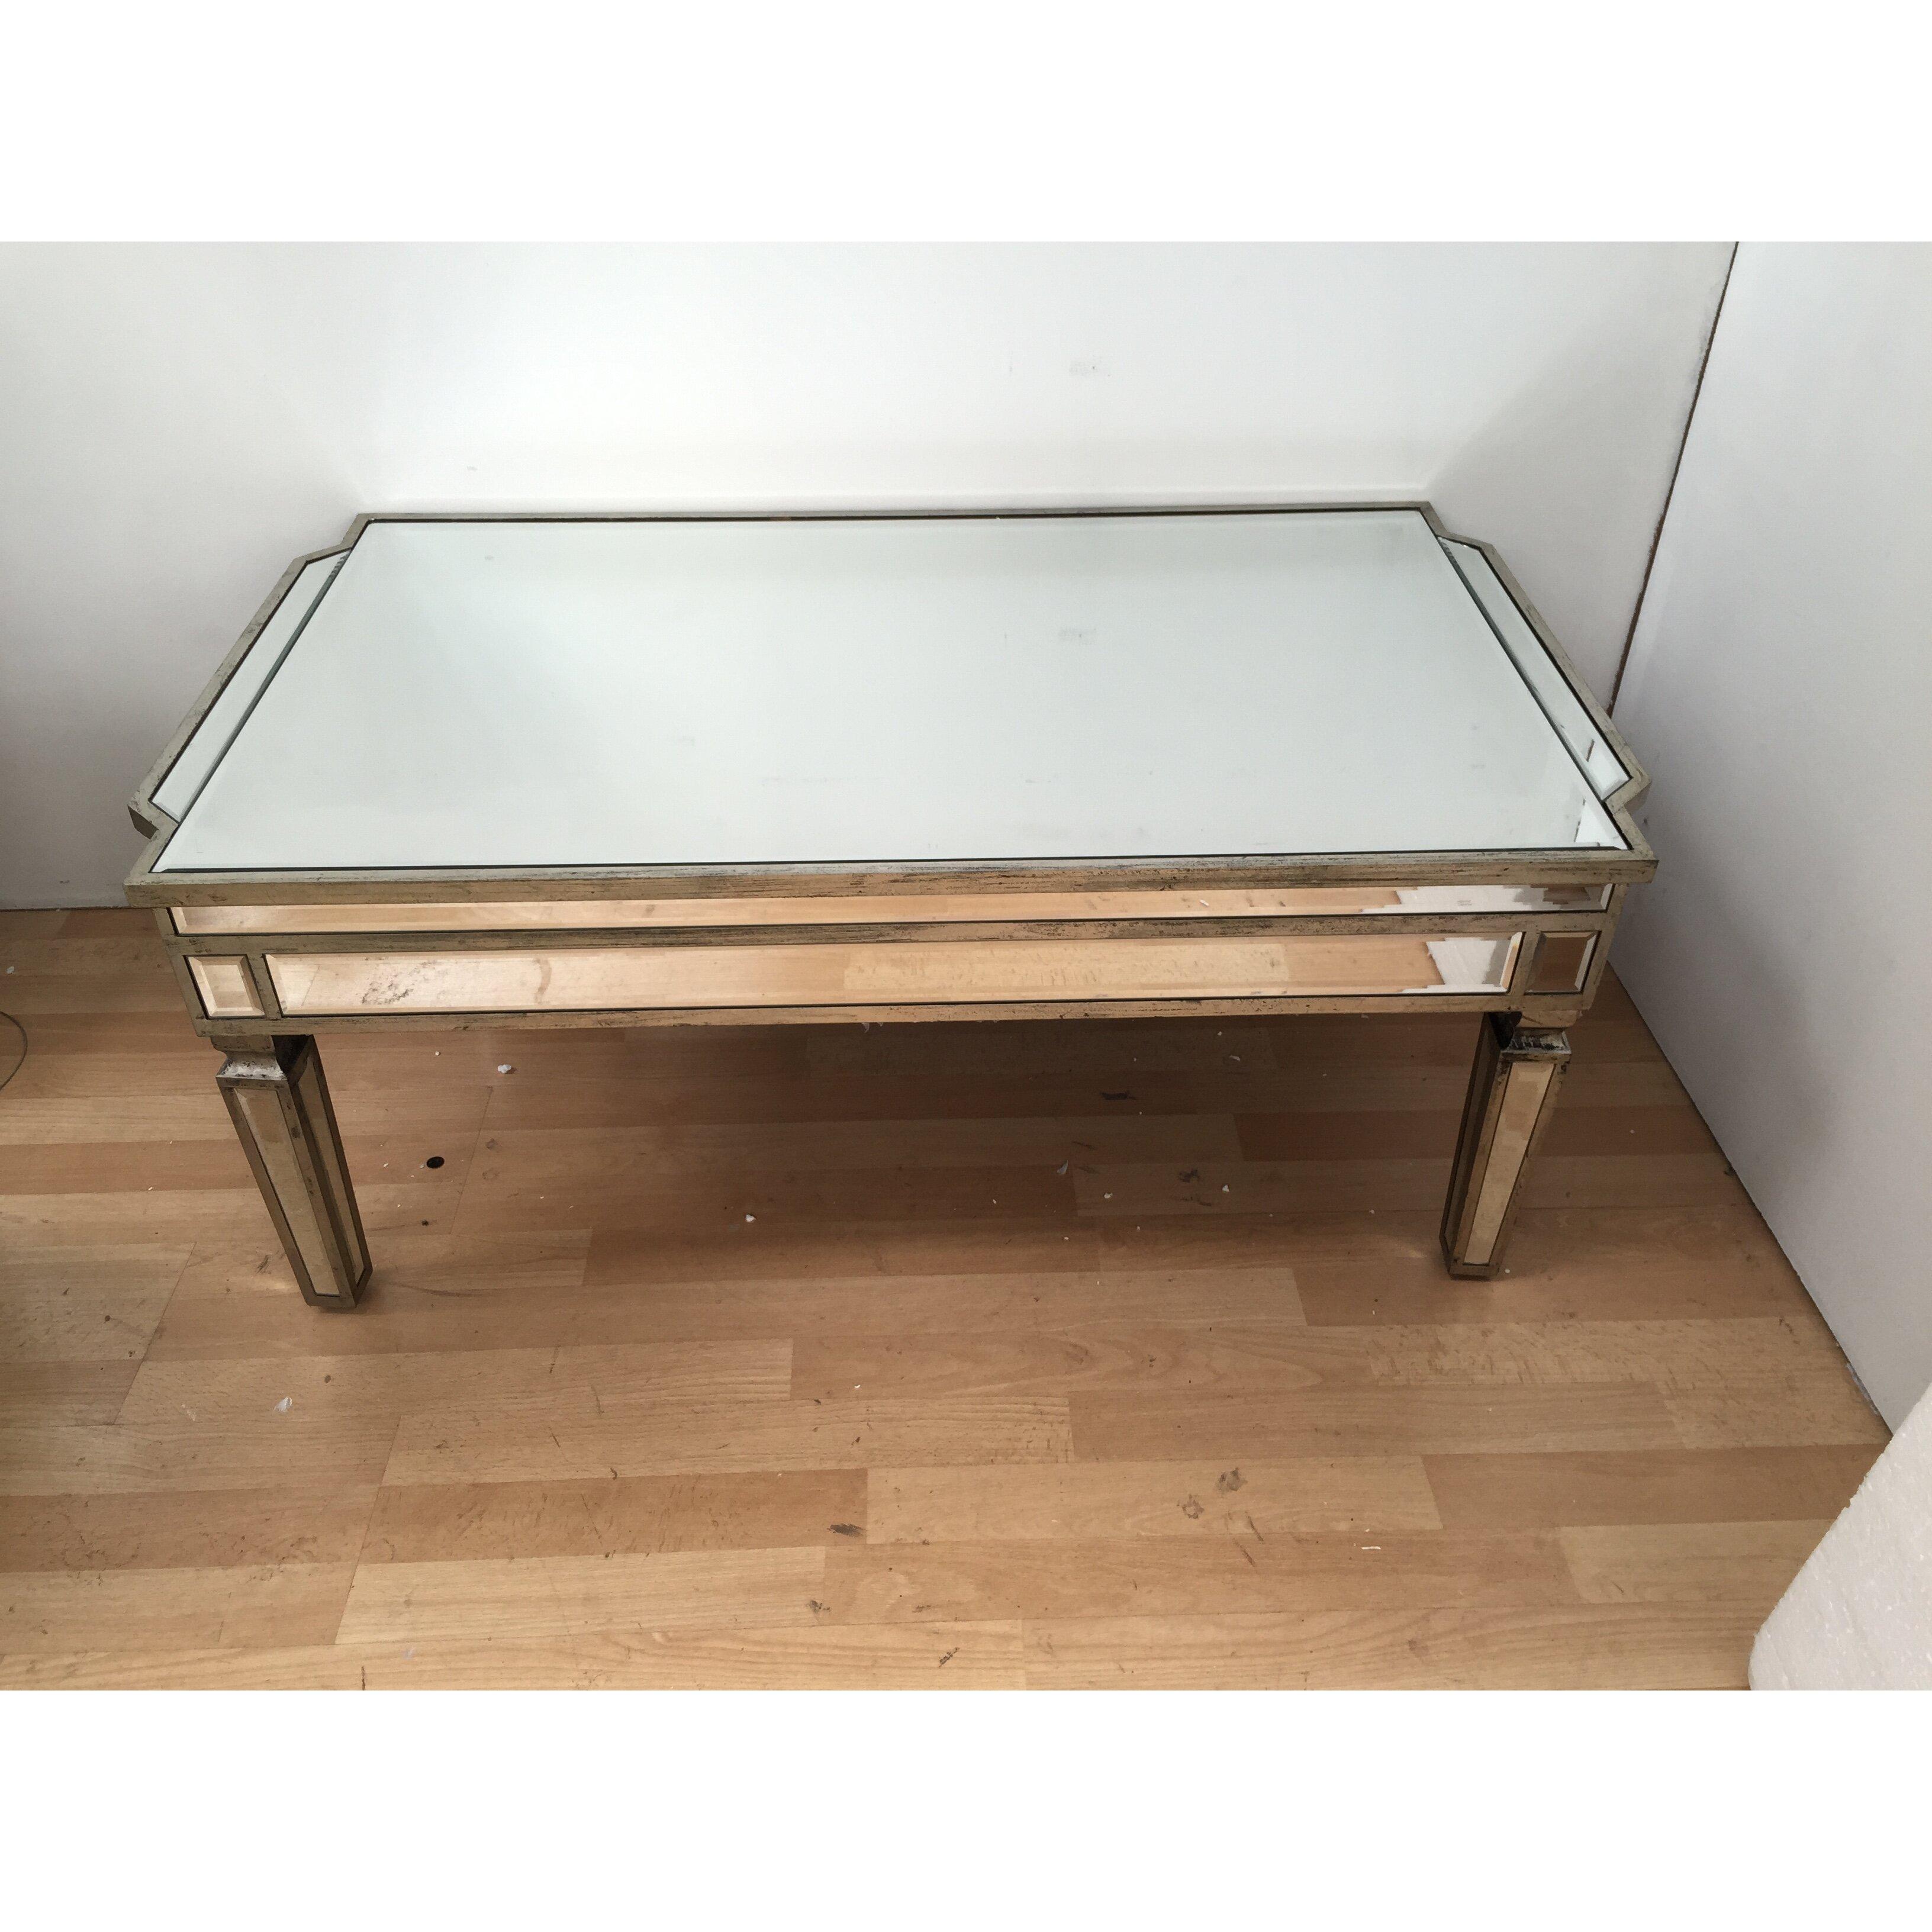 Wayfair Glass Coffee Table Uk: Alterton Vintage Mirrored Coffee Table & Reviews